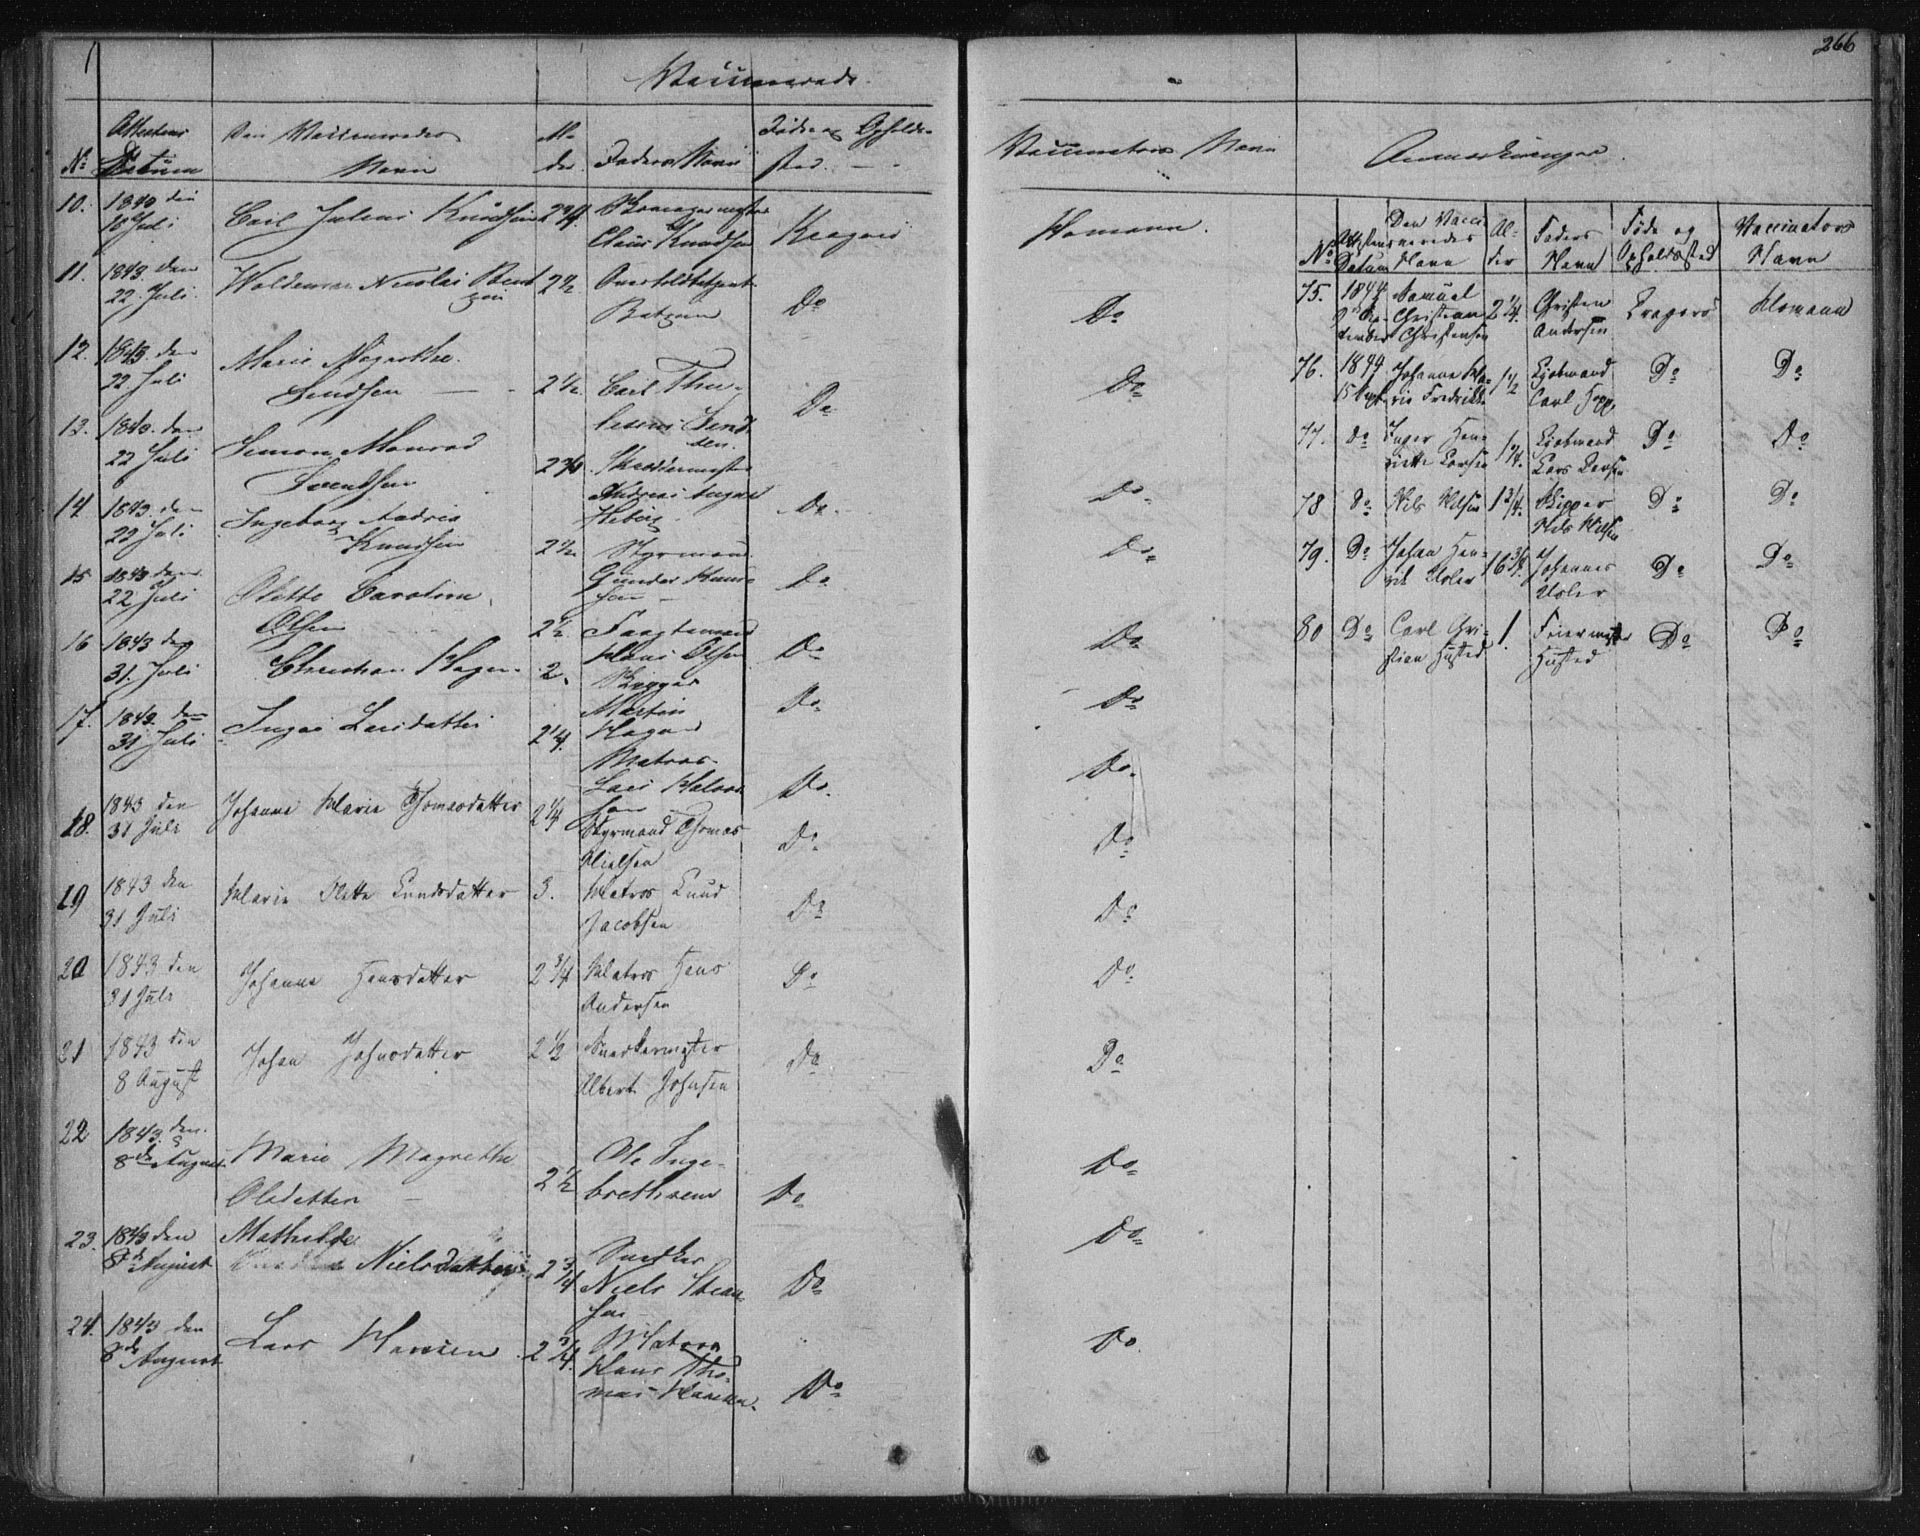 SAKO, Kragerø kirkebøker, F/Fa/L0005: Ministerialbok nr. 5, 1832-1847, s. 266